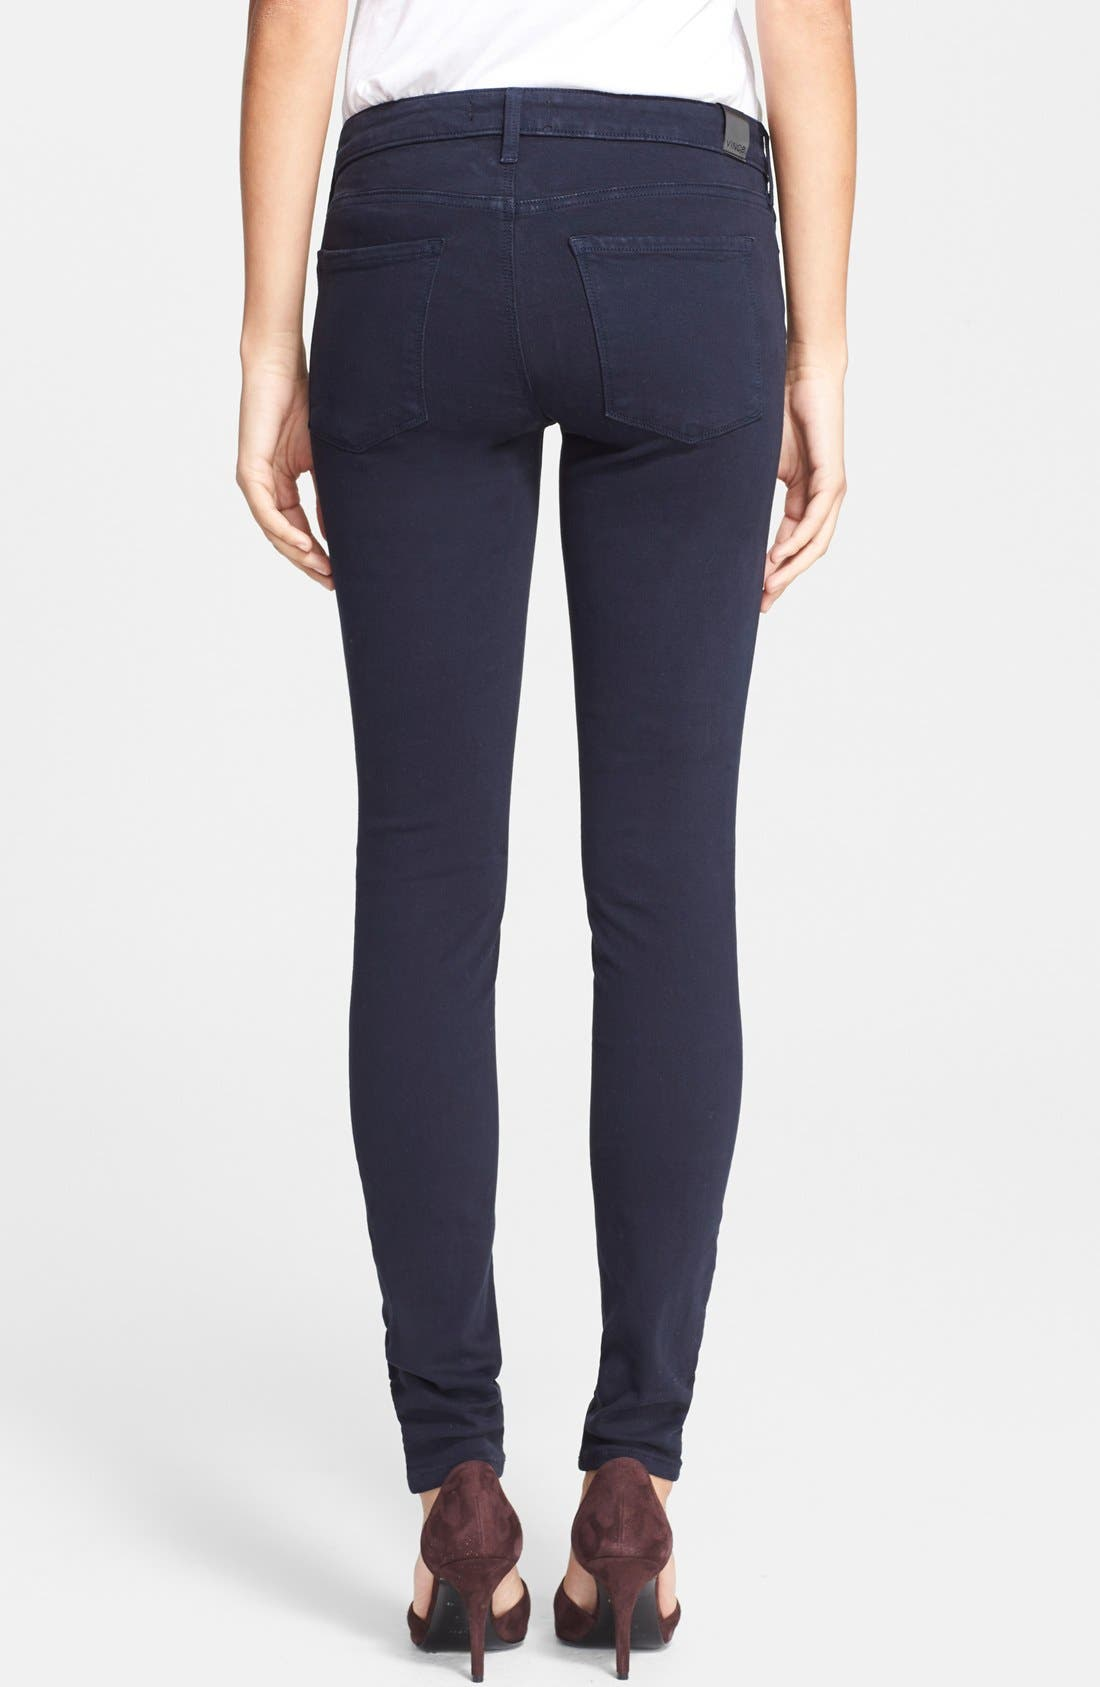 Alternate Image 2  - Vince 'Riley' Skinny Jeans (Coastal Blue)